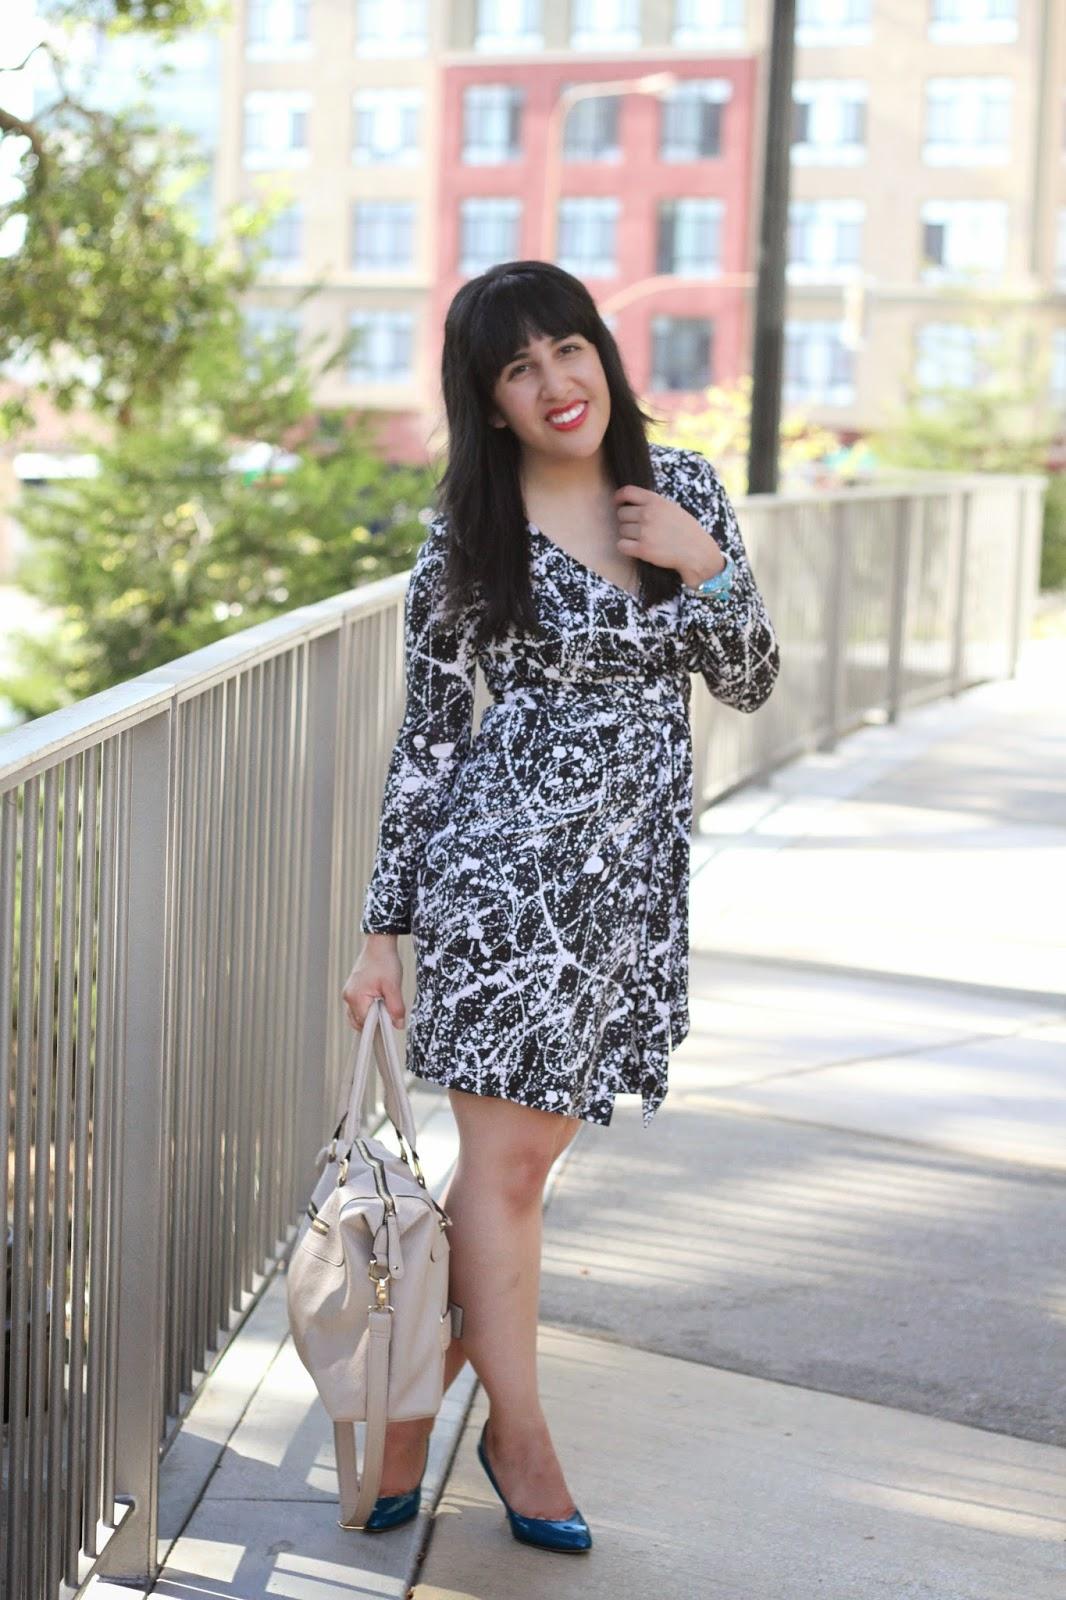 Journey of a Dress